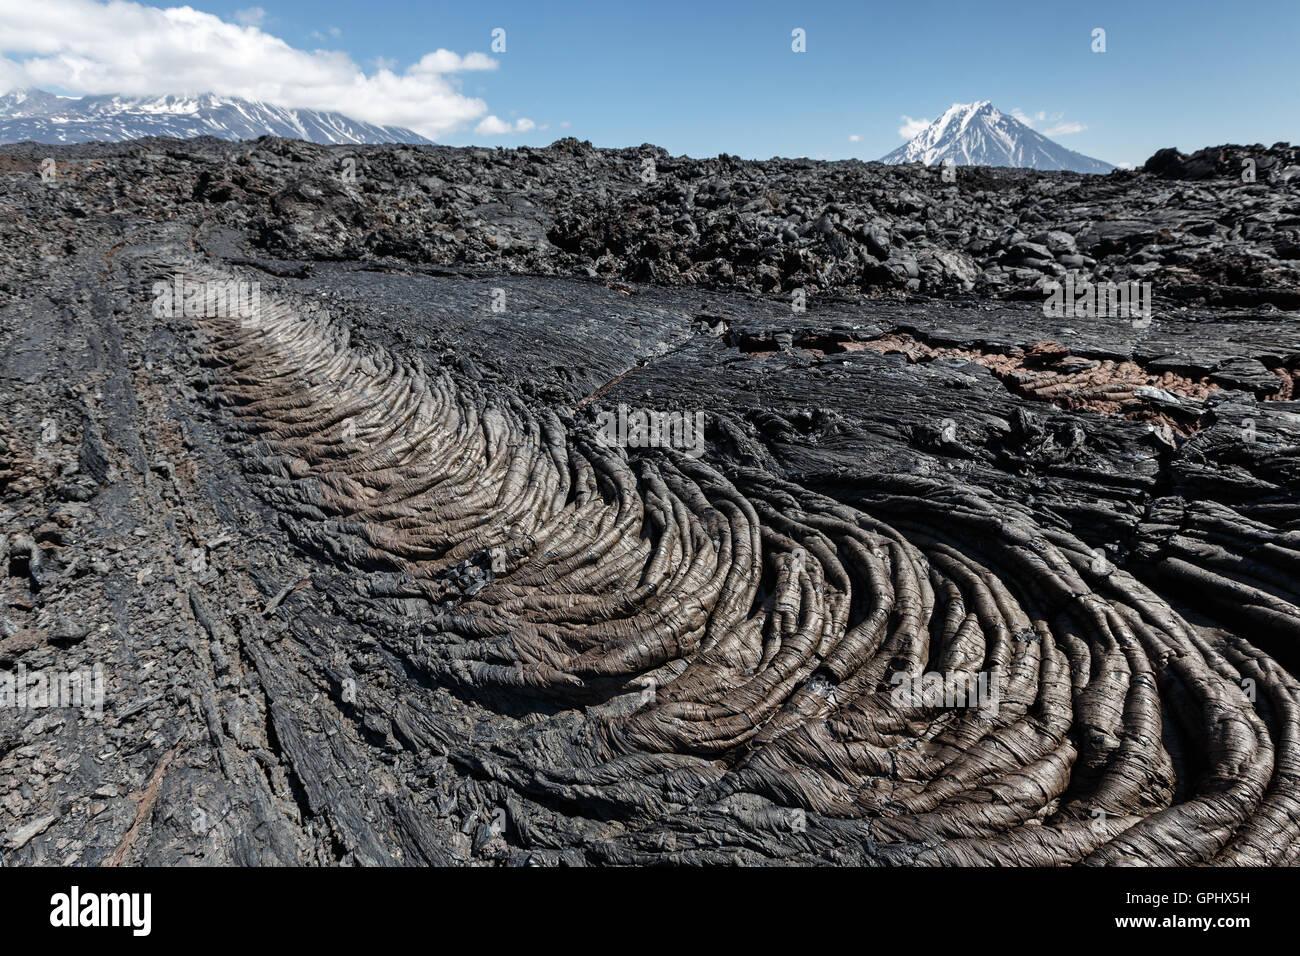 Volcanic landscape of Kamchatka Peninsula: beautiful view of lava field volcanic eruption active Plosky Tolbachik - Stock Image